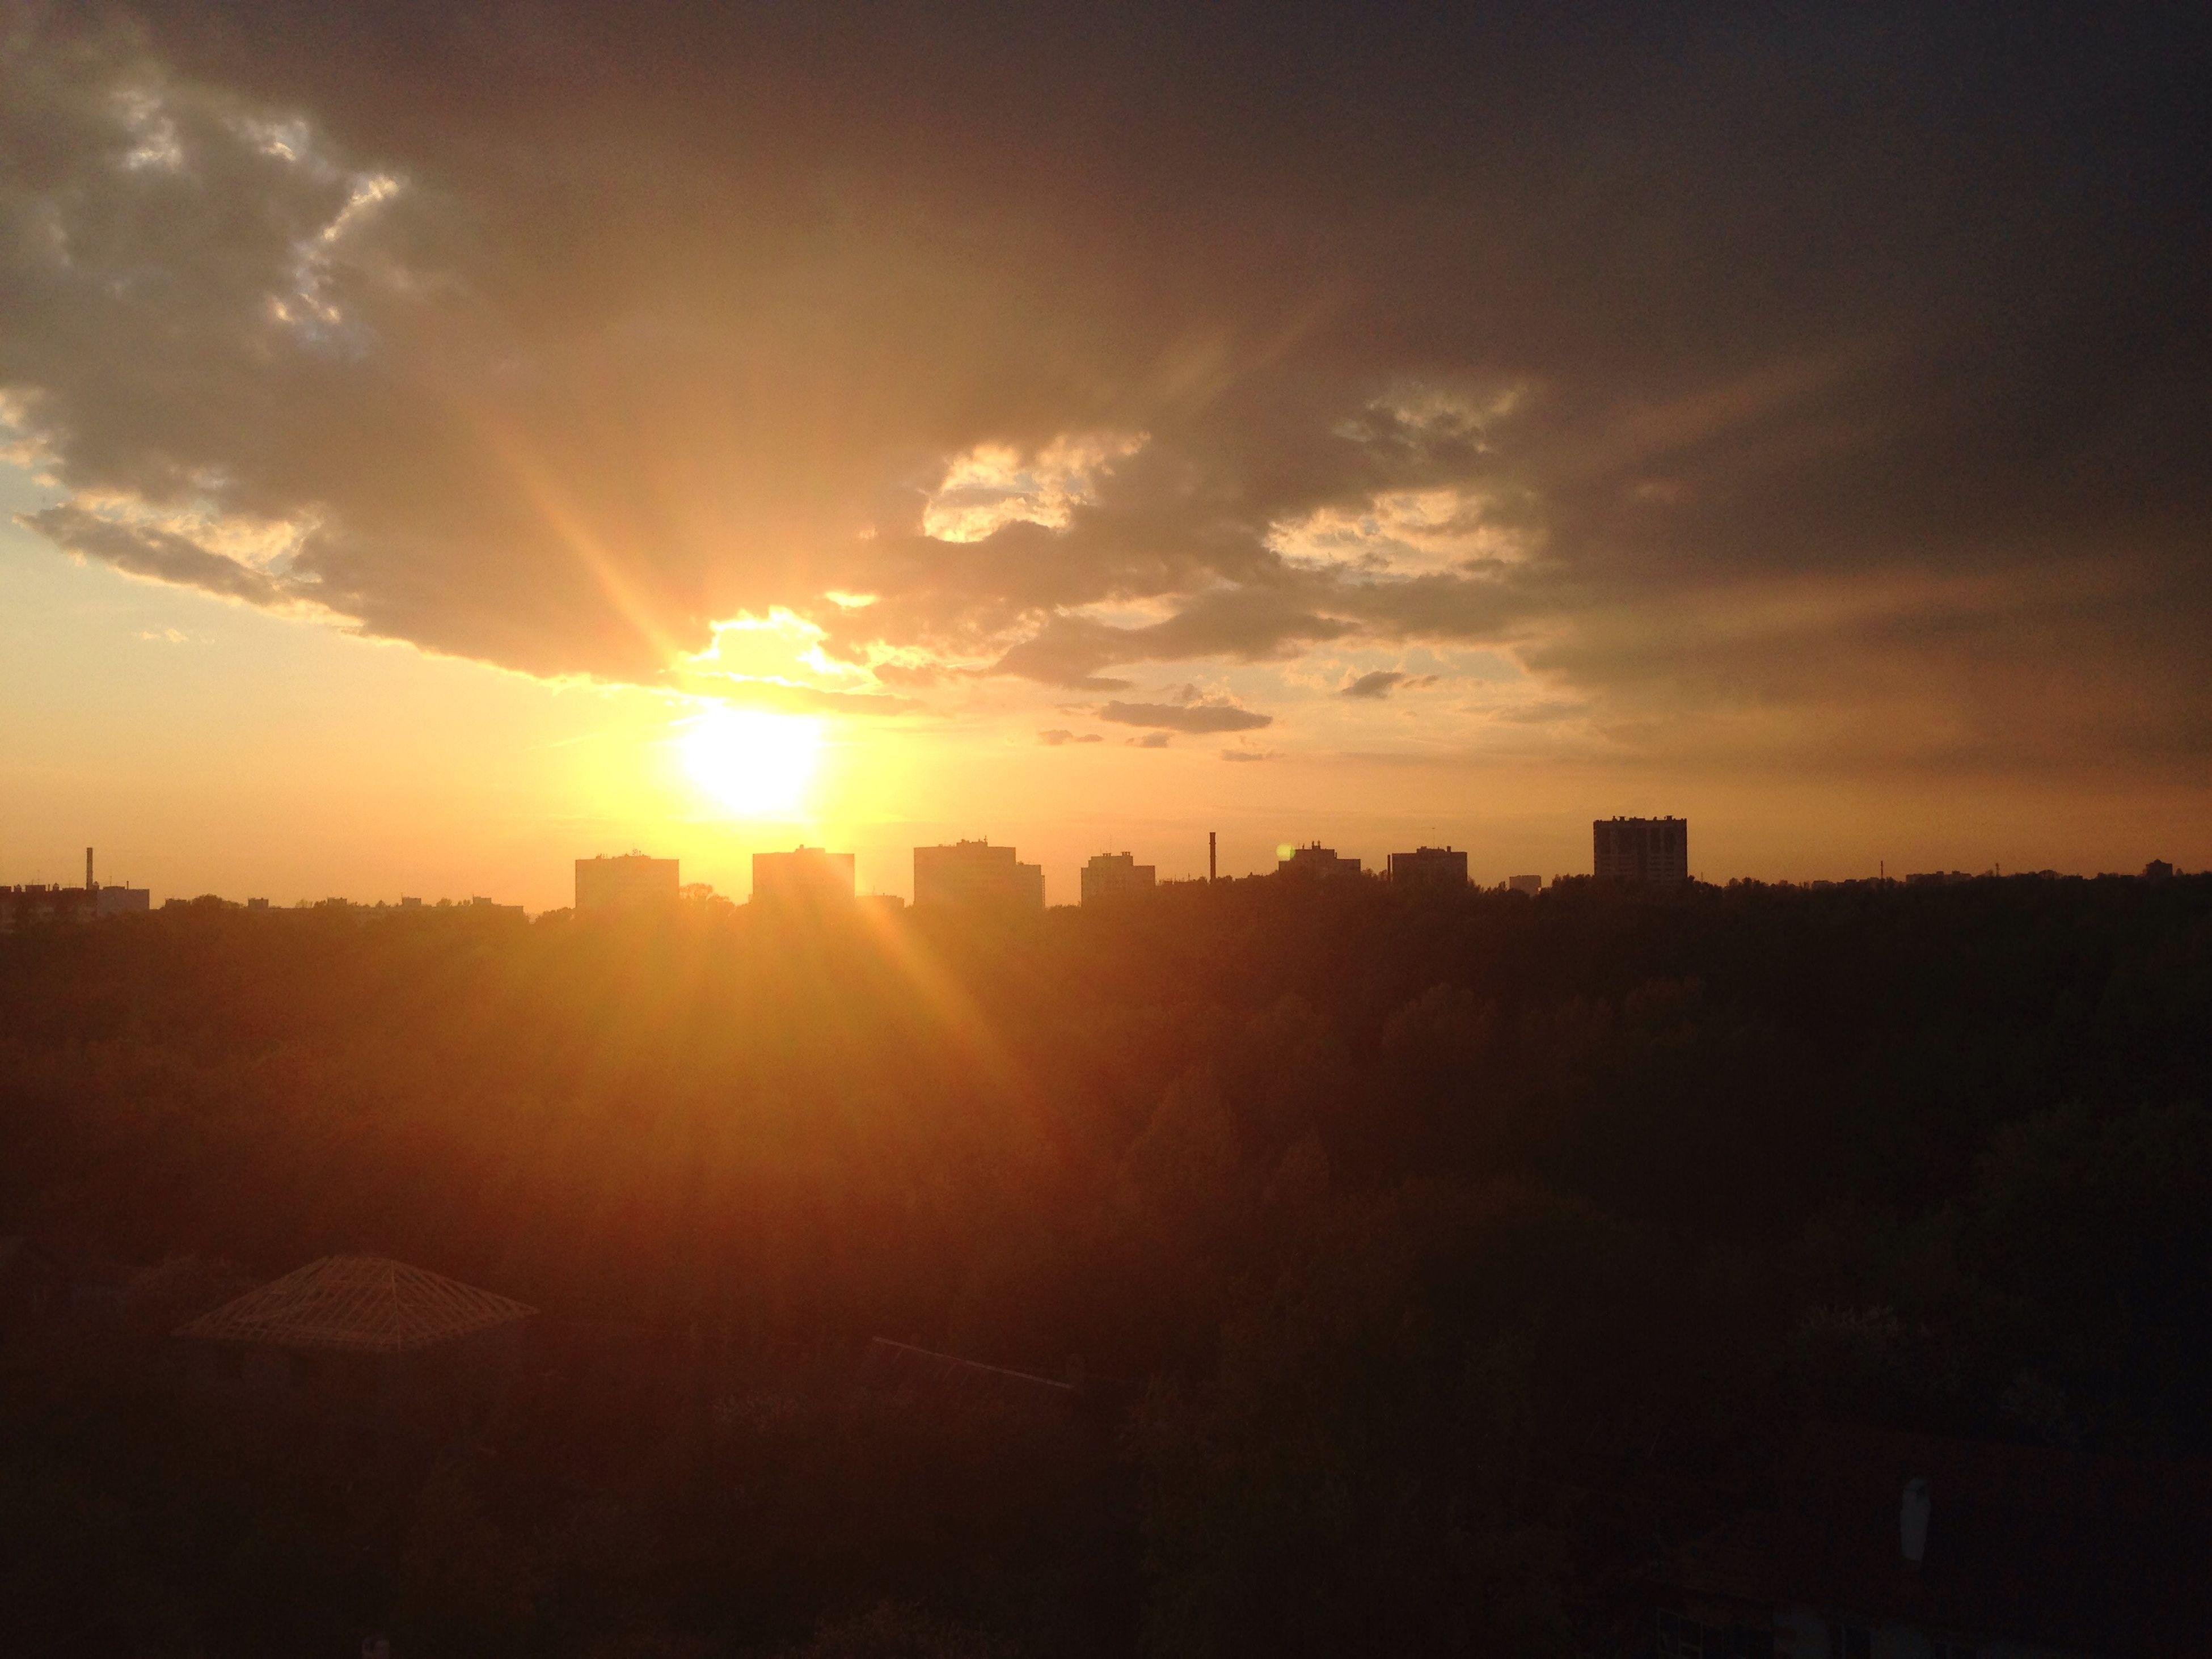 sunset, sun, silhouette, sky, sunlight, orange color, sunbeam, scenics, building exterior, beauty in nature, cloud - sky, built structure, architecture, lens flare, tranquility, tranquil scene, nature, city, idyllic, outdoors